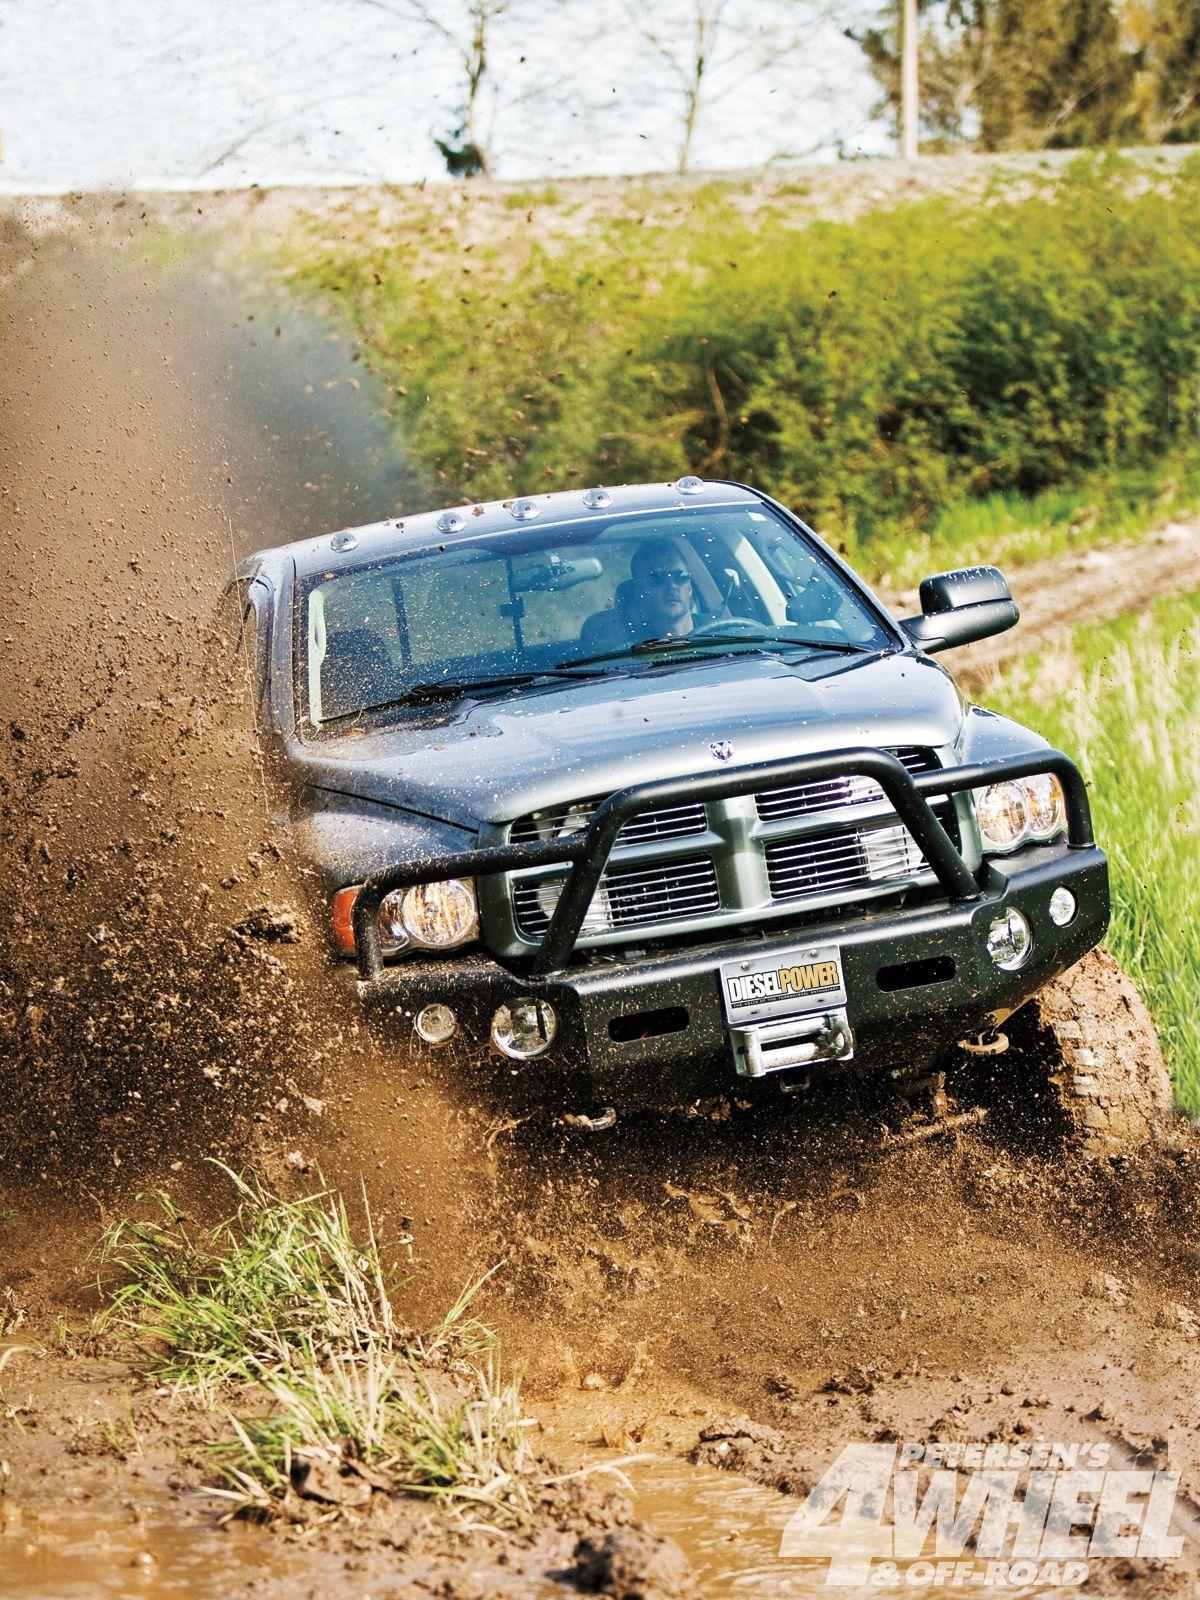 dodge ram lifted mudding - Dodge Ram 1500 Lifted Mudding